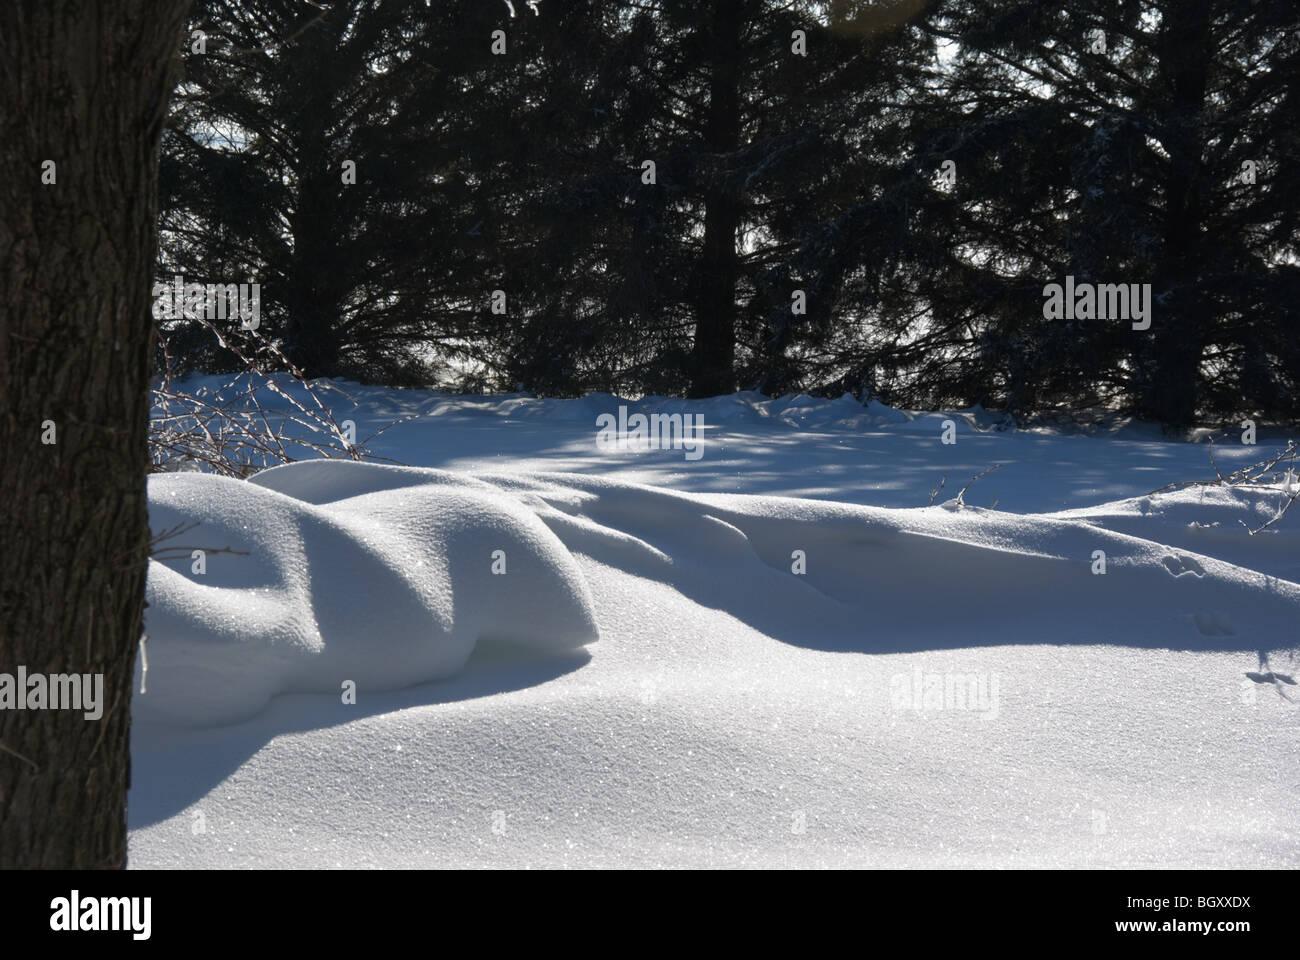 A wintery snowdrift scene - Stock Image